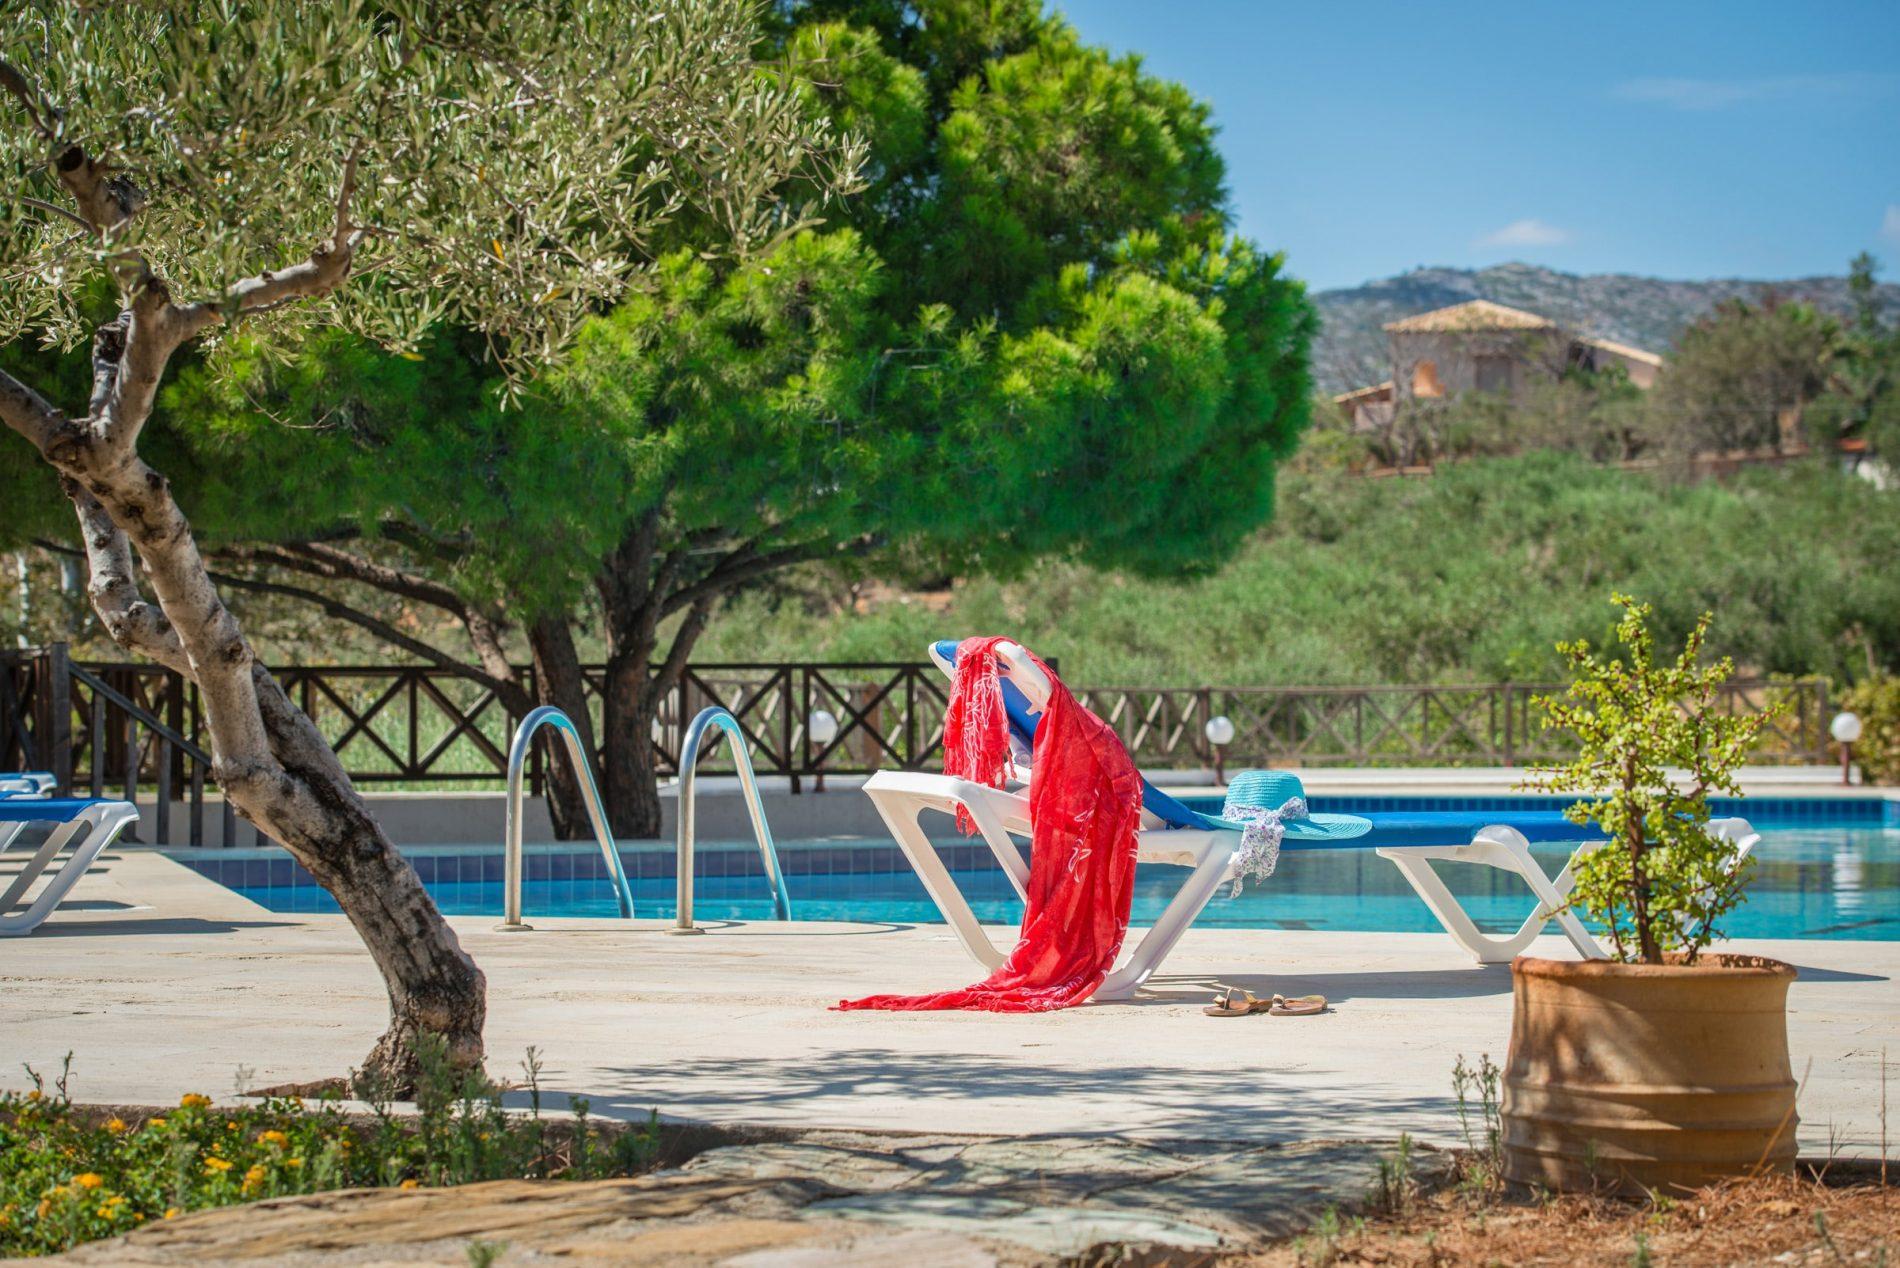 ambelos apartments and studios agia pelagia crete greece nature peacefulness cretan hospitality relaxation holidays tranquillity